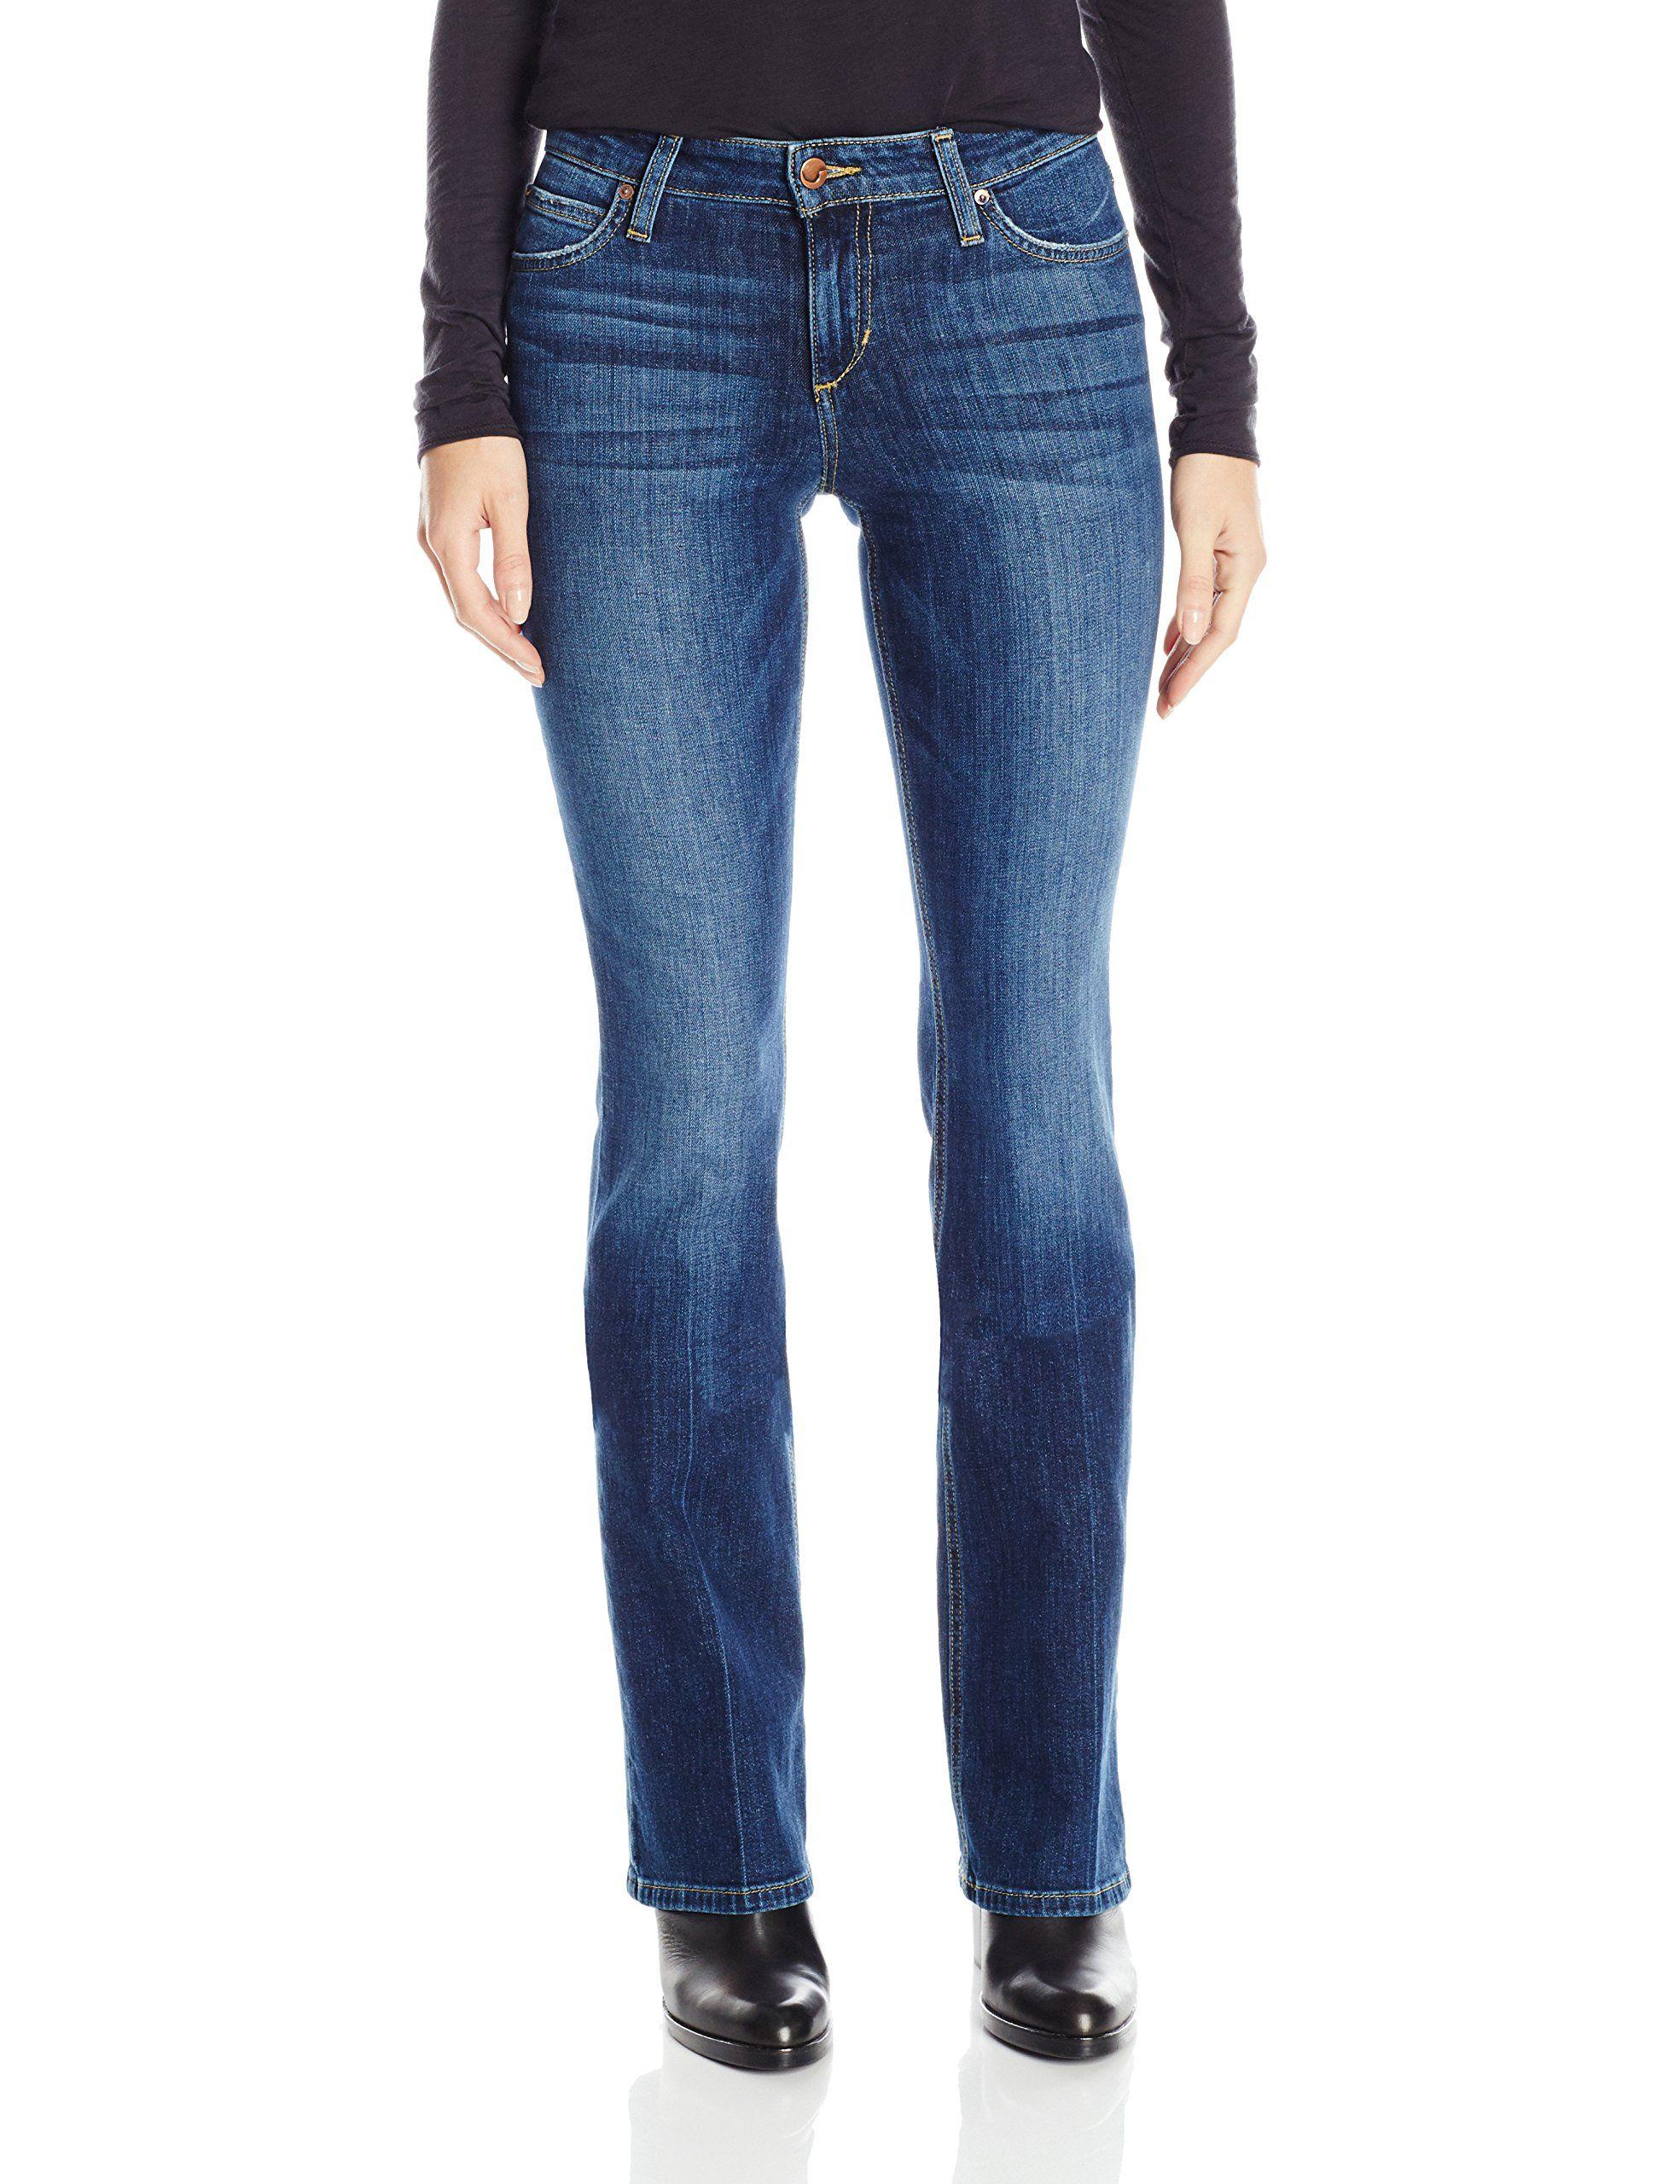 Joeus jeans womenus honey curvy bootcut jean in amina apparel